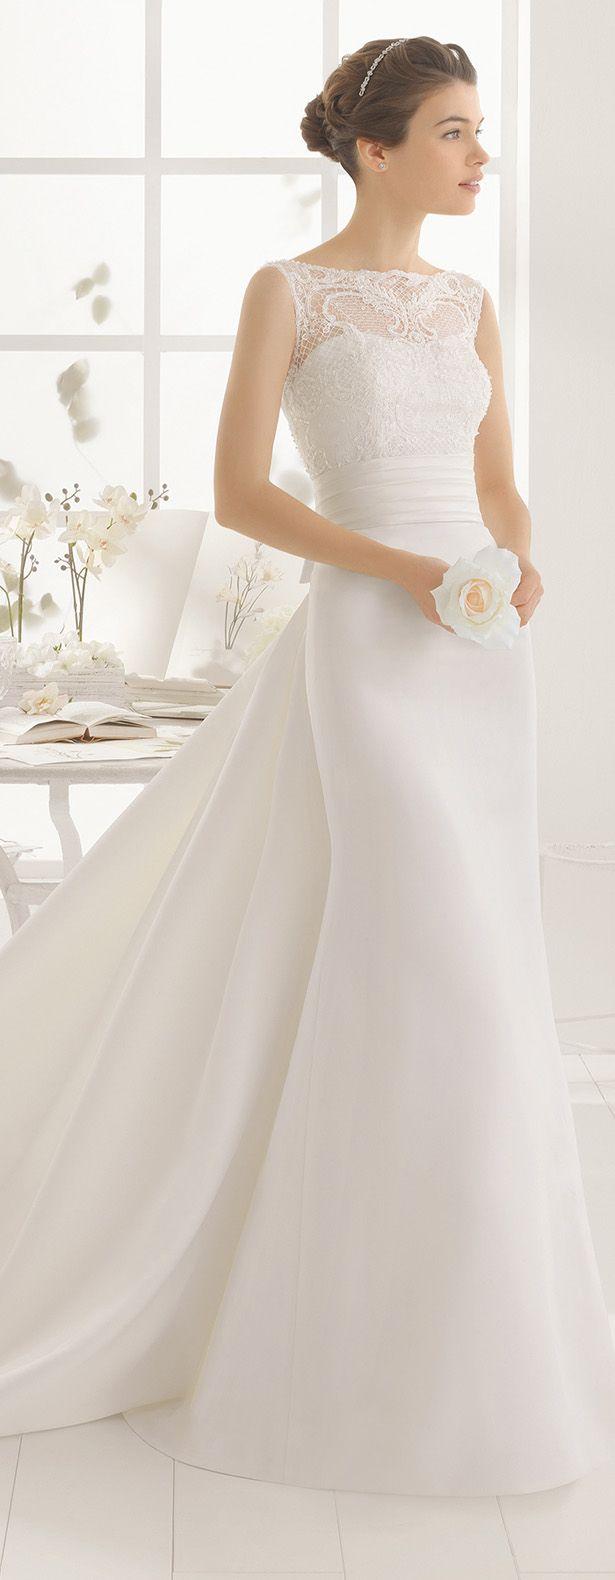 Chinese wedding dress rental los angeles  Nandie Leana babdaline on Pinterest